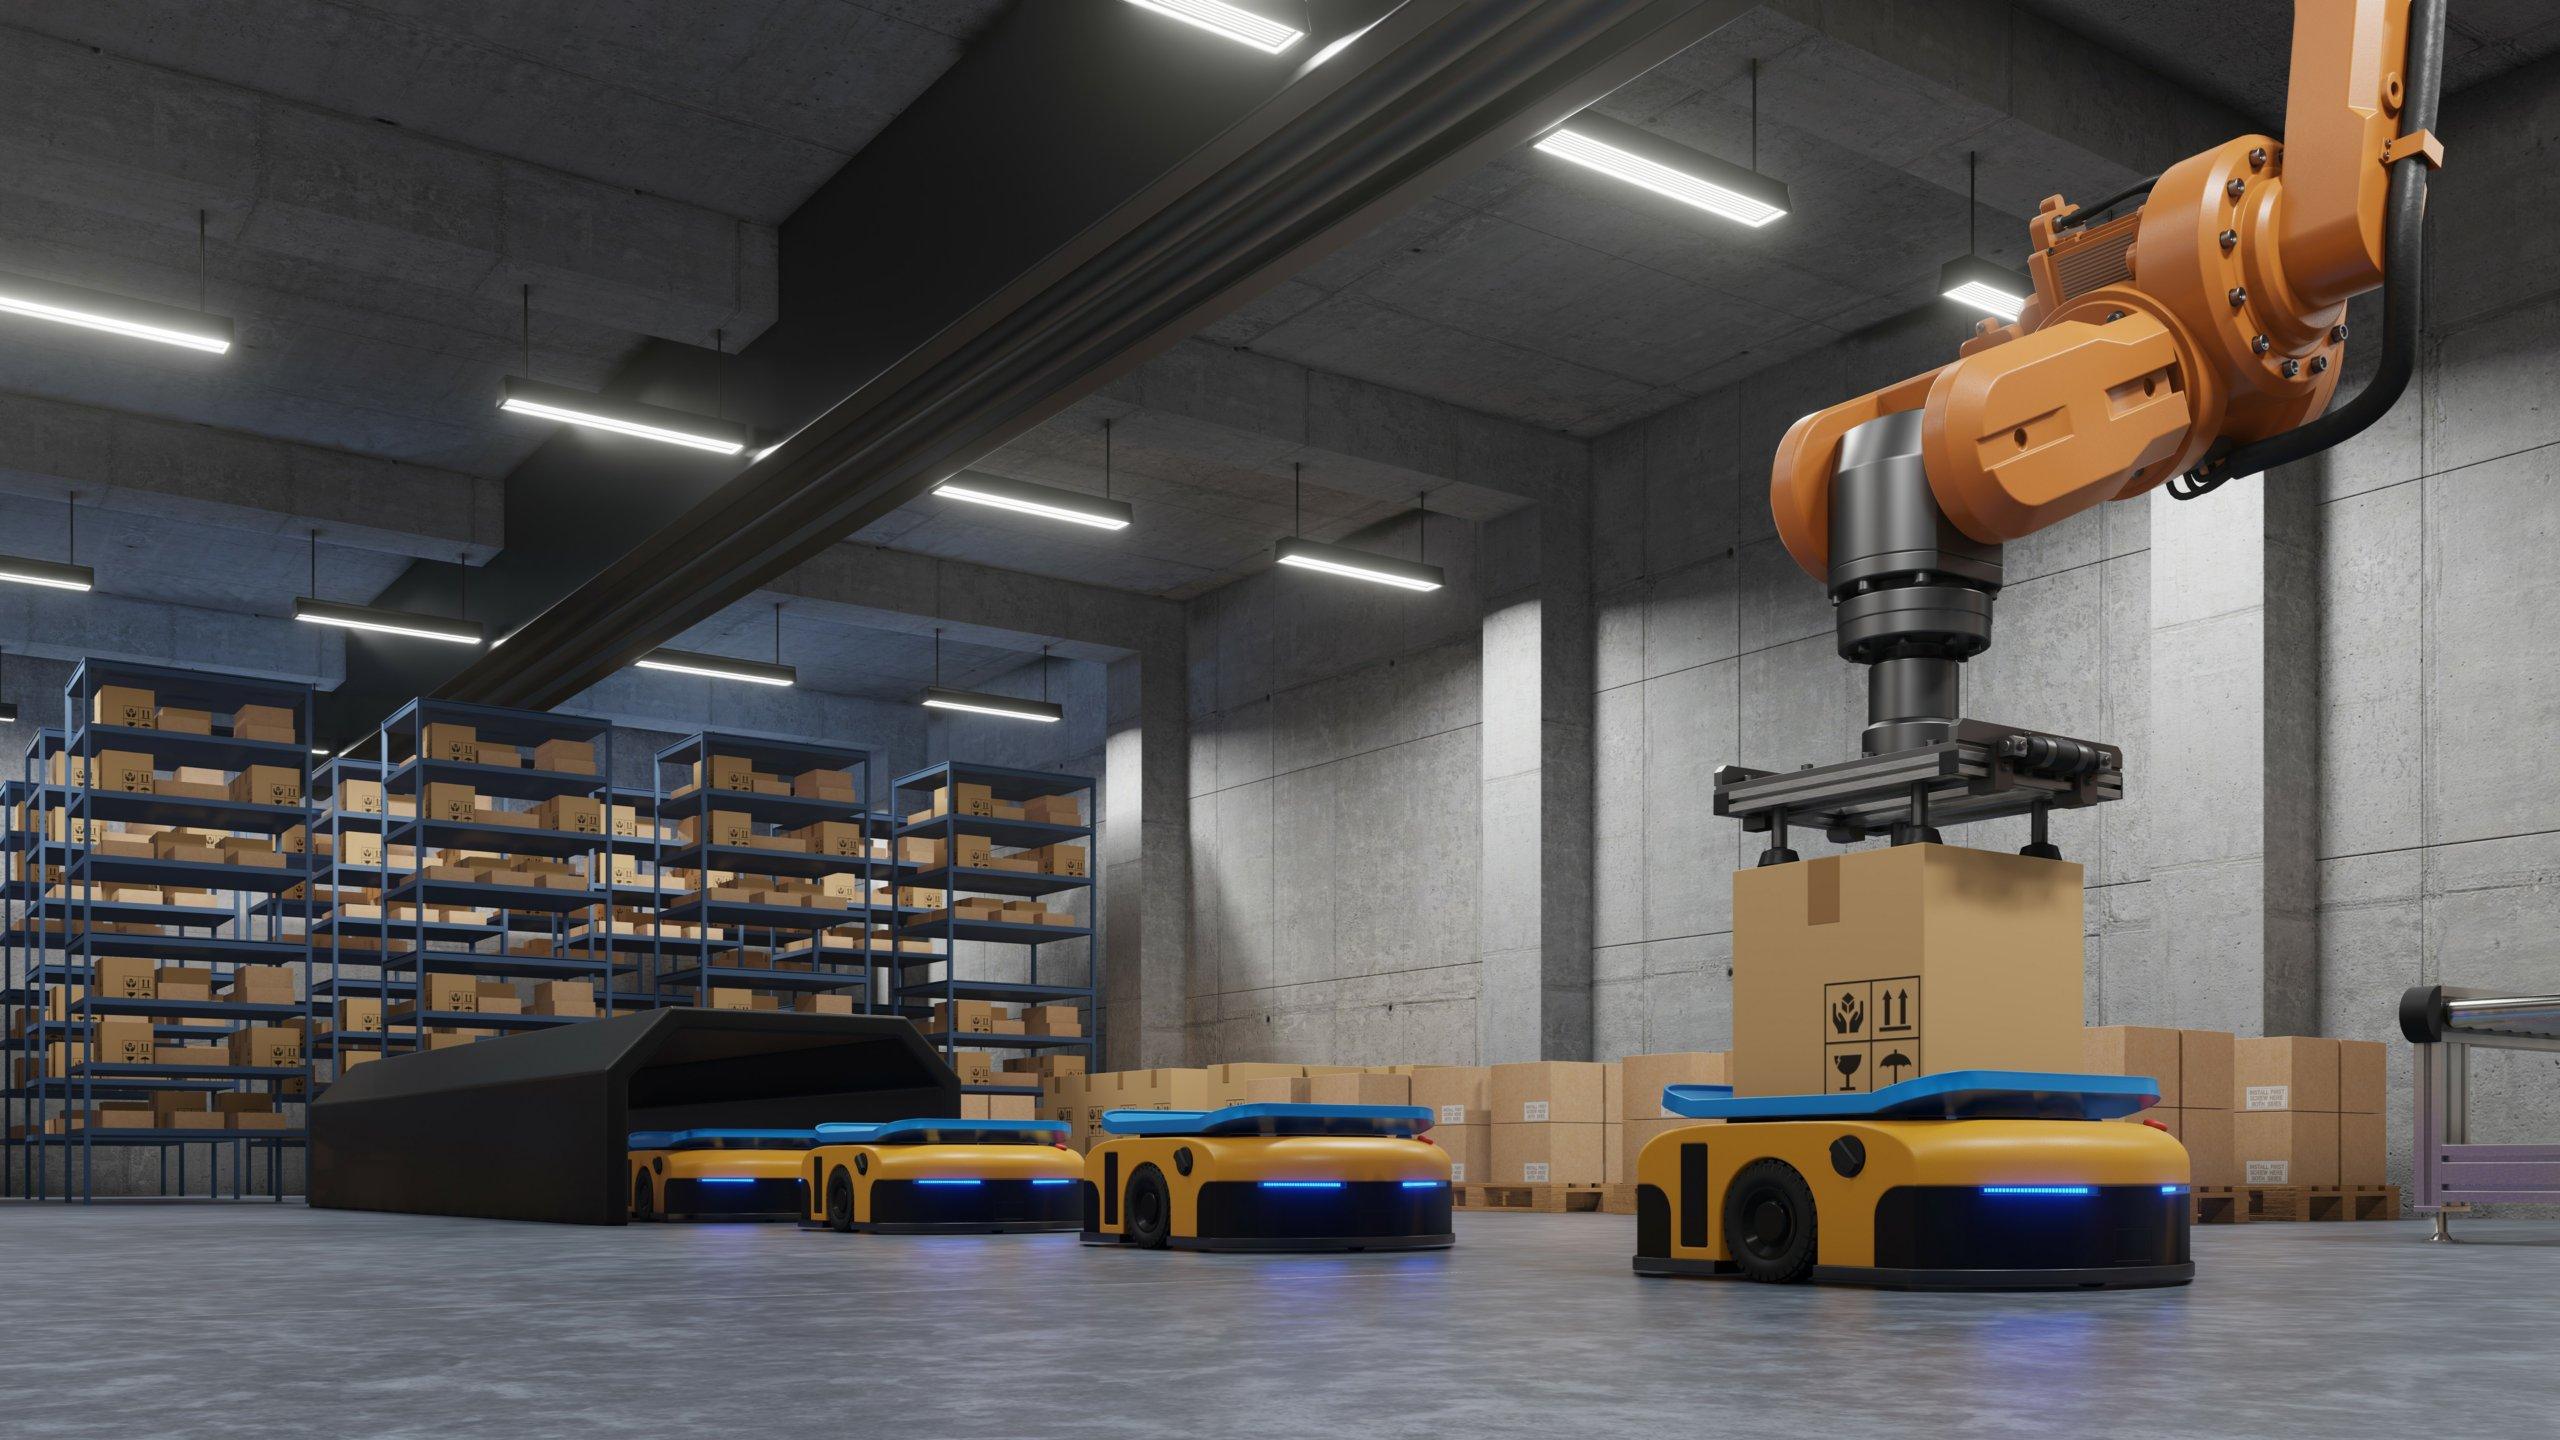 Sistemas automatizados de manejo de materiales